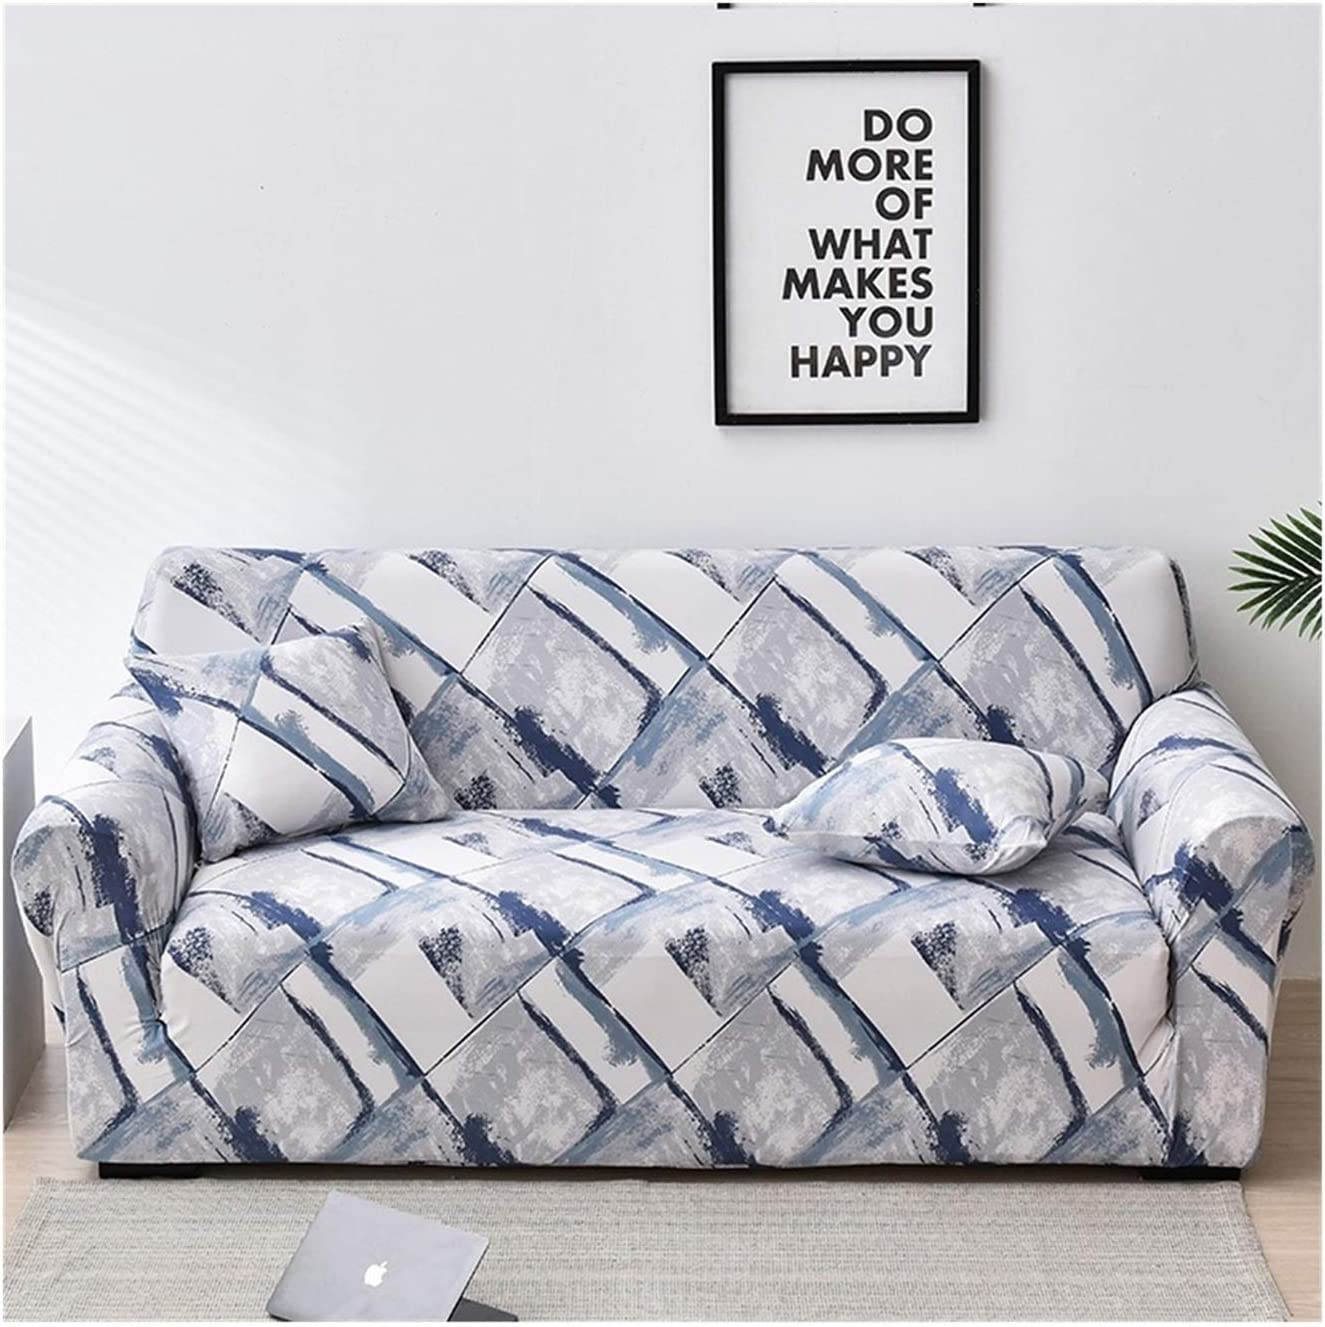 JPMSB Elastic Sofa Cover for Manufacturer OFFicial shop Living Modern Corner Sectional Room Challenge the lowest price